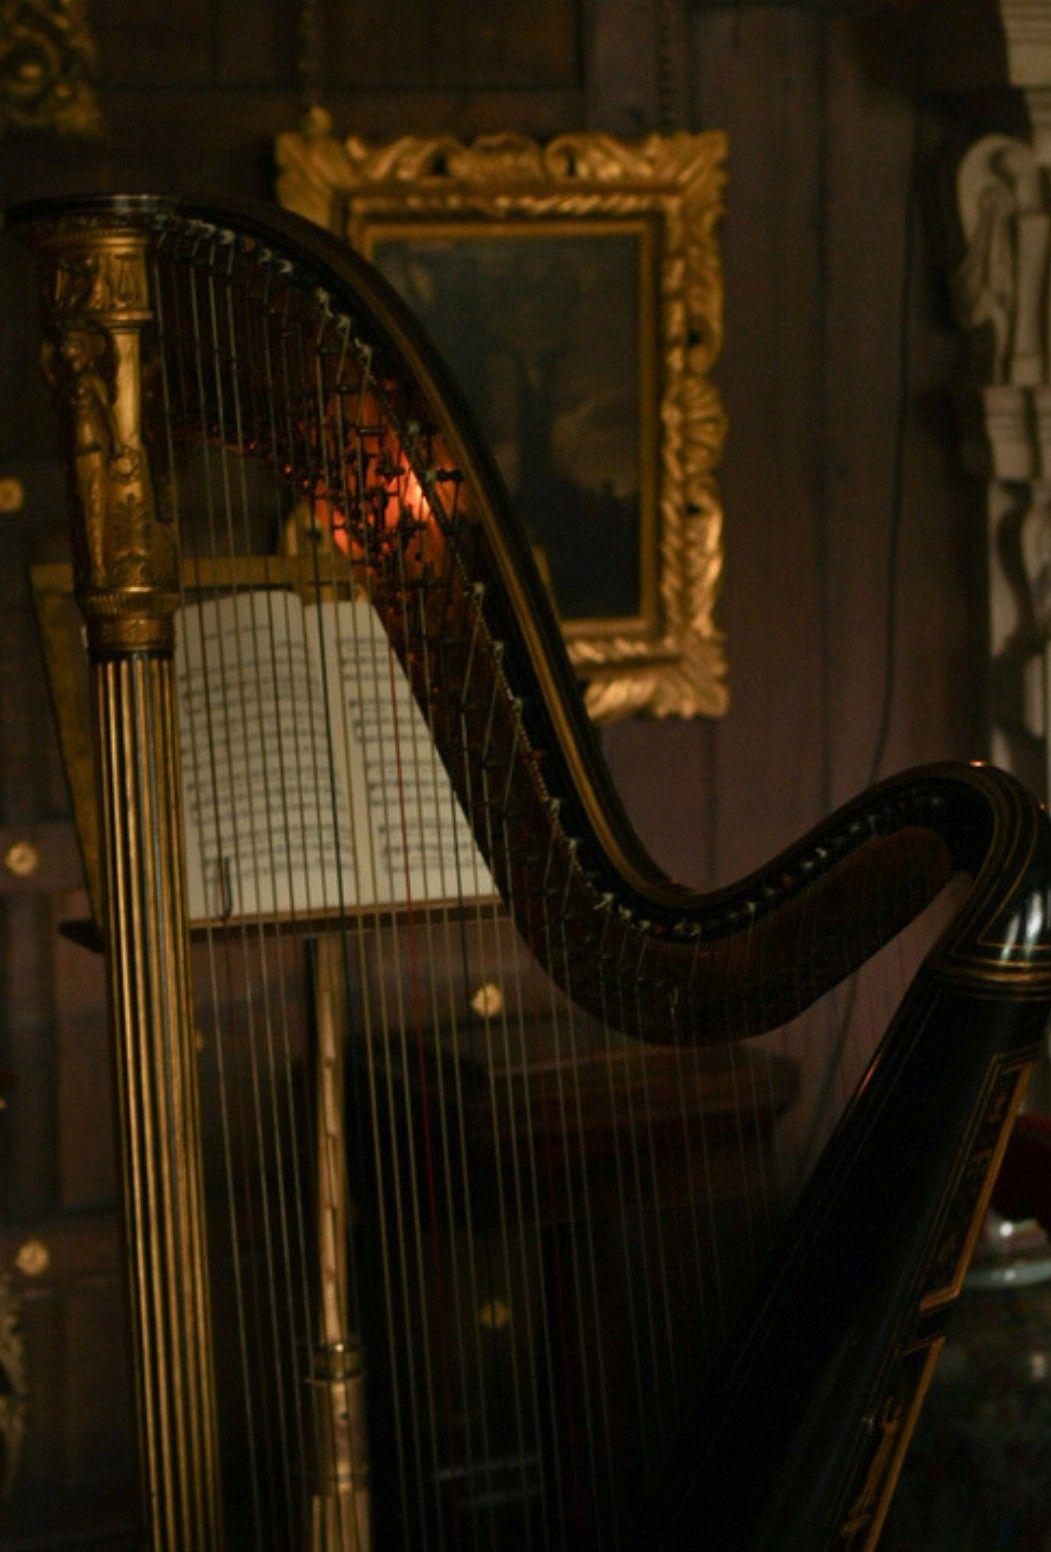 Pin By Dj On Dark Academia Aesthetic Harp Music Love Music Art